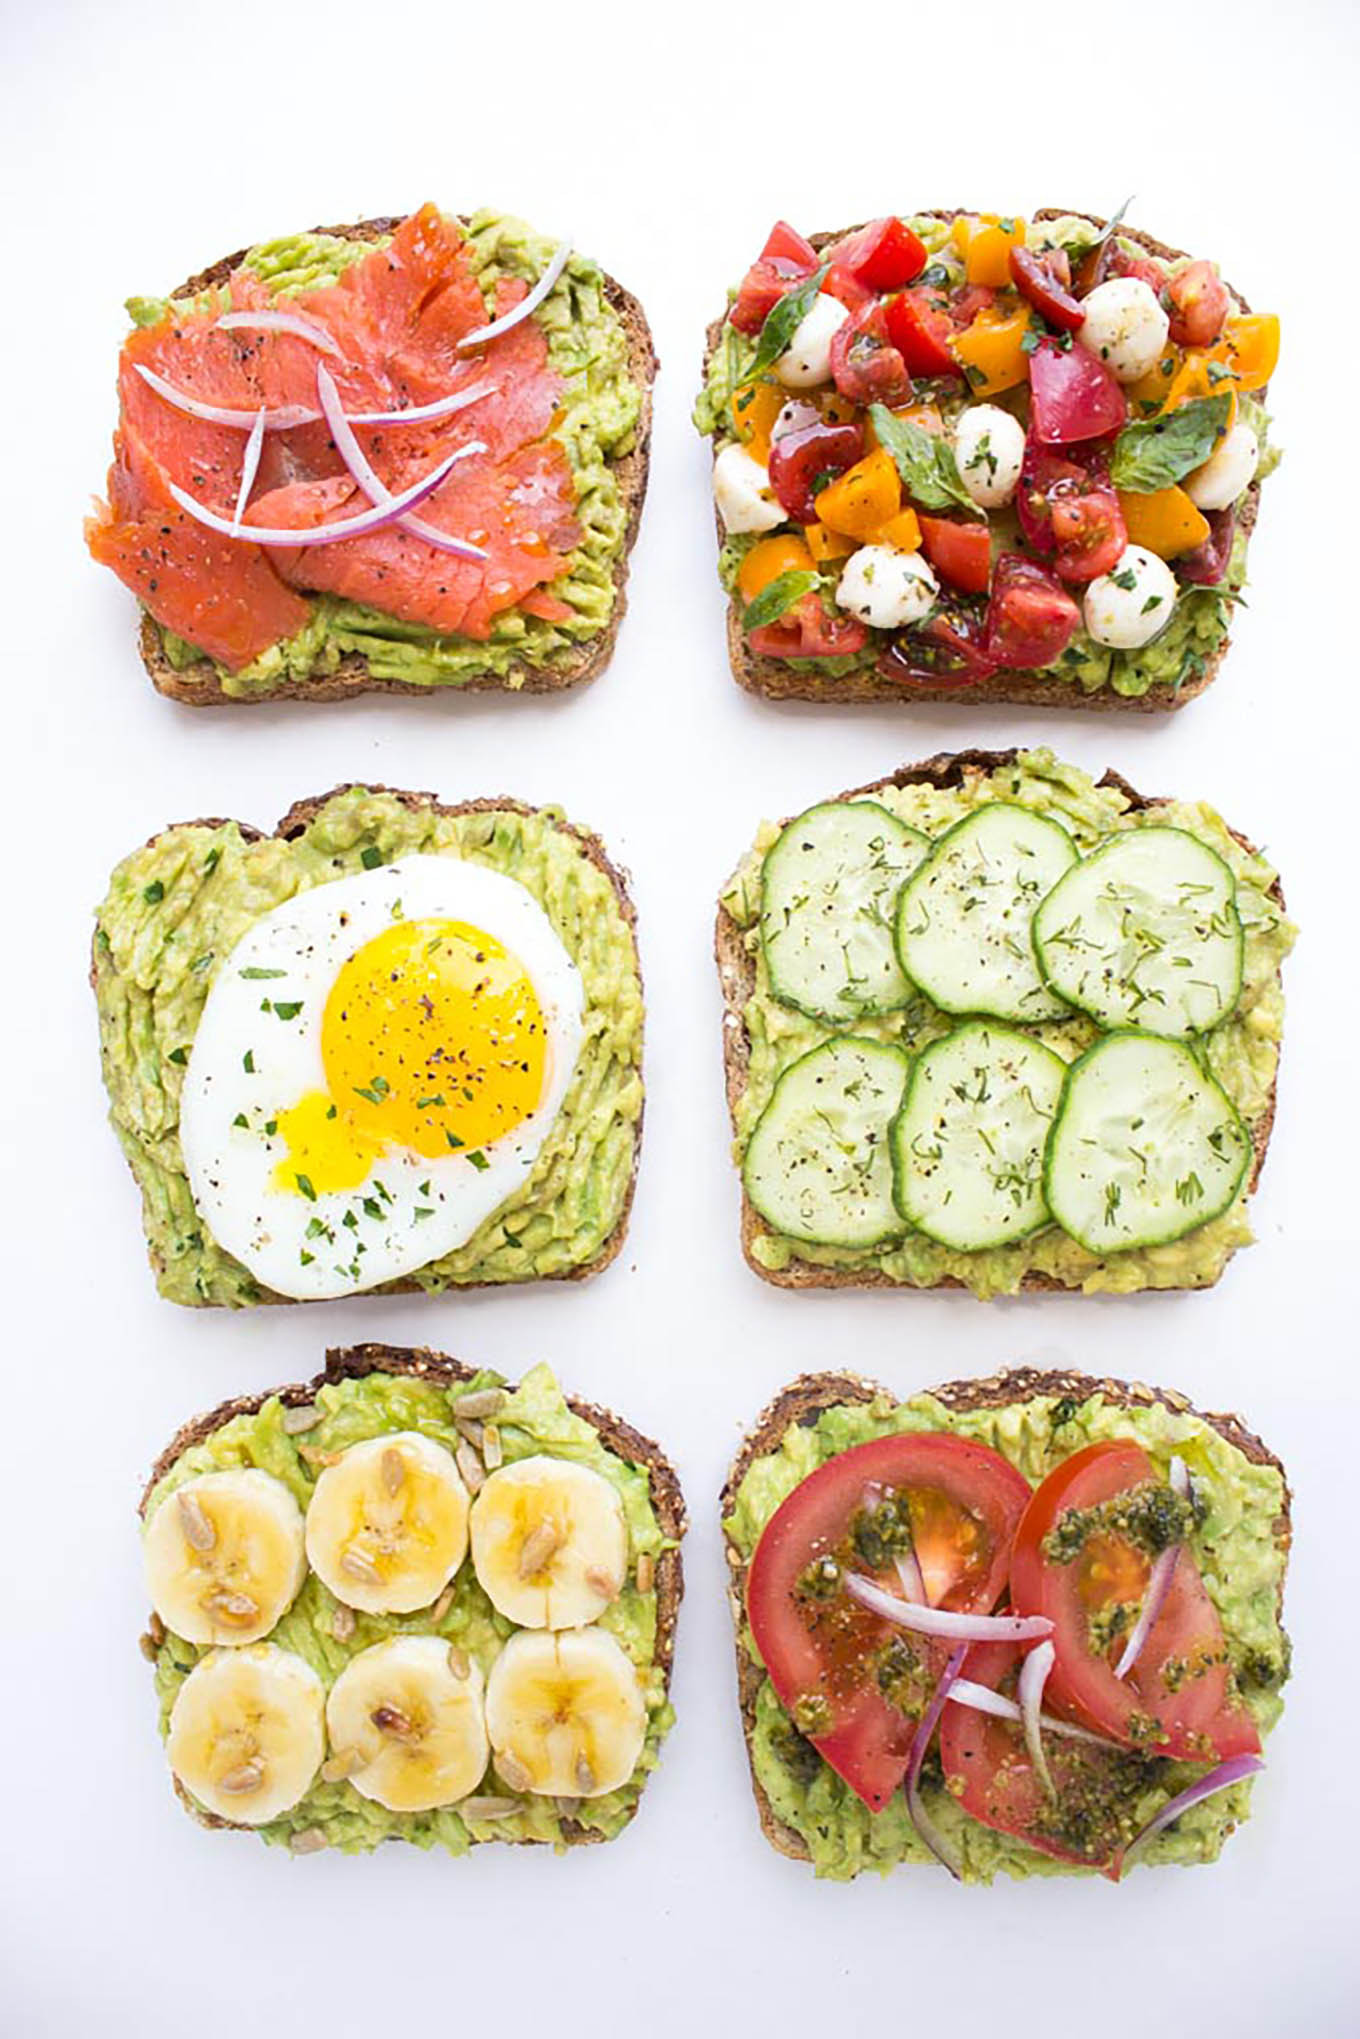 Avocado Breakfast Recipes  5 Healthy & Deliciously Easy Breakfast Recipes Hello Fashion